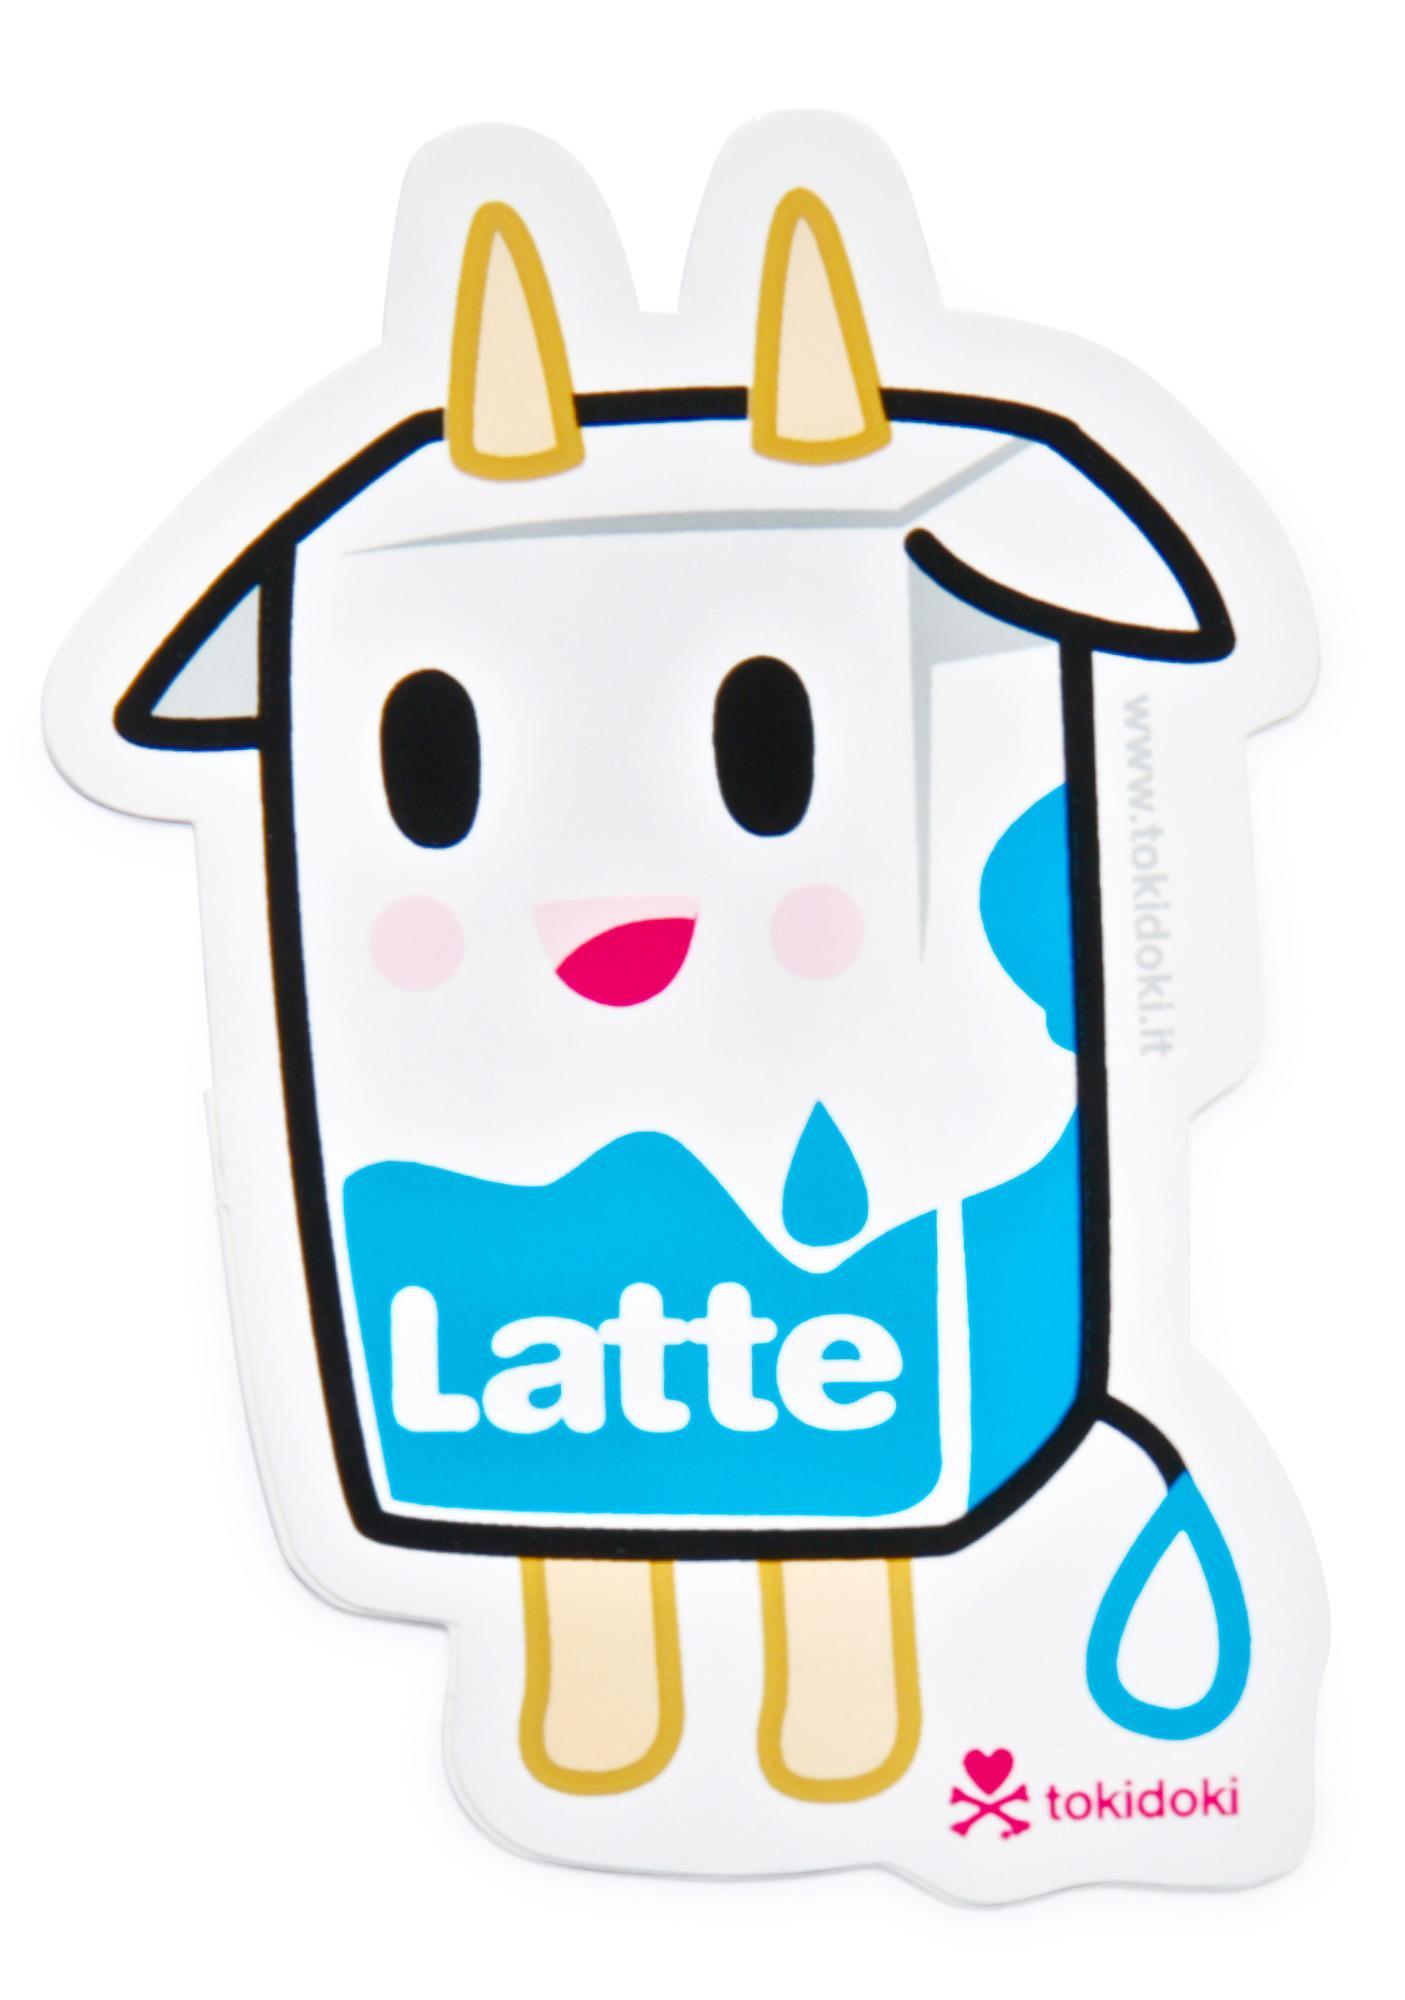 Tokidoki Latte Sticker